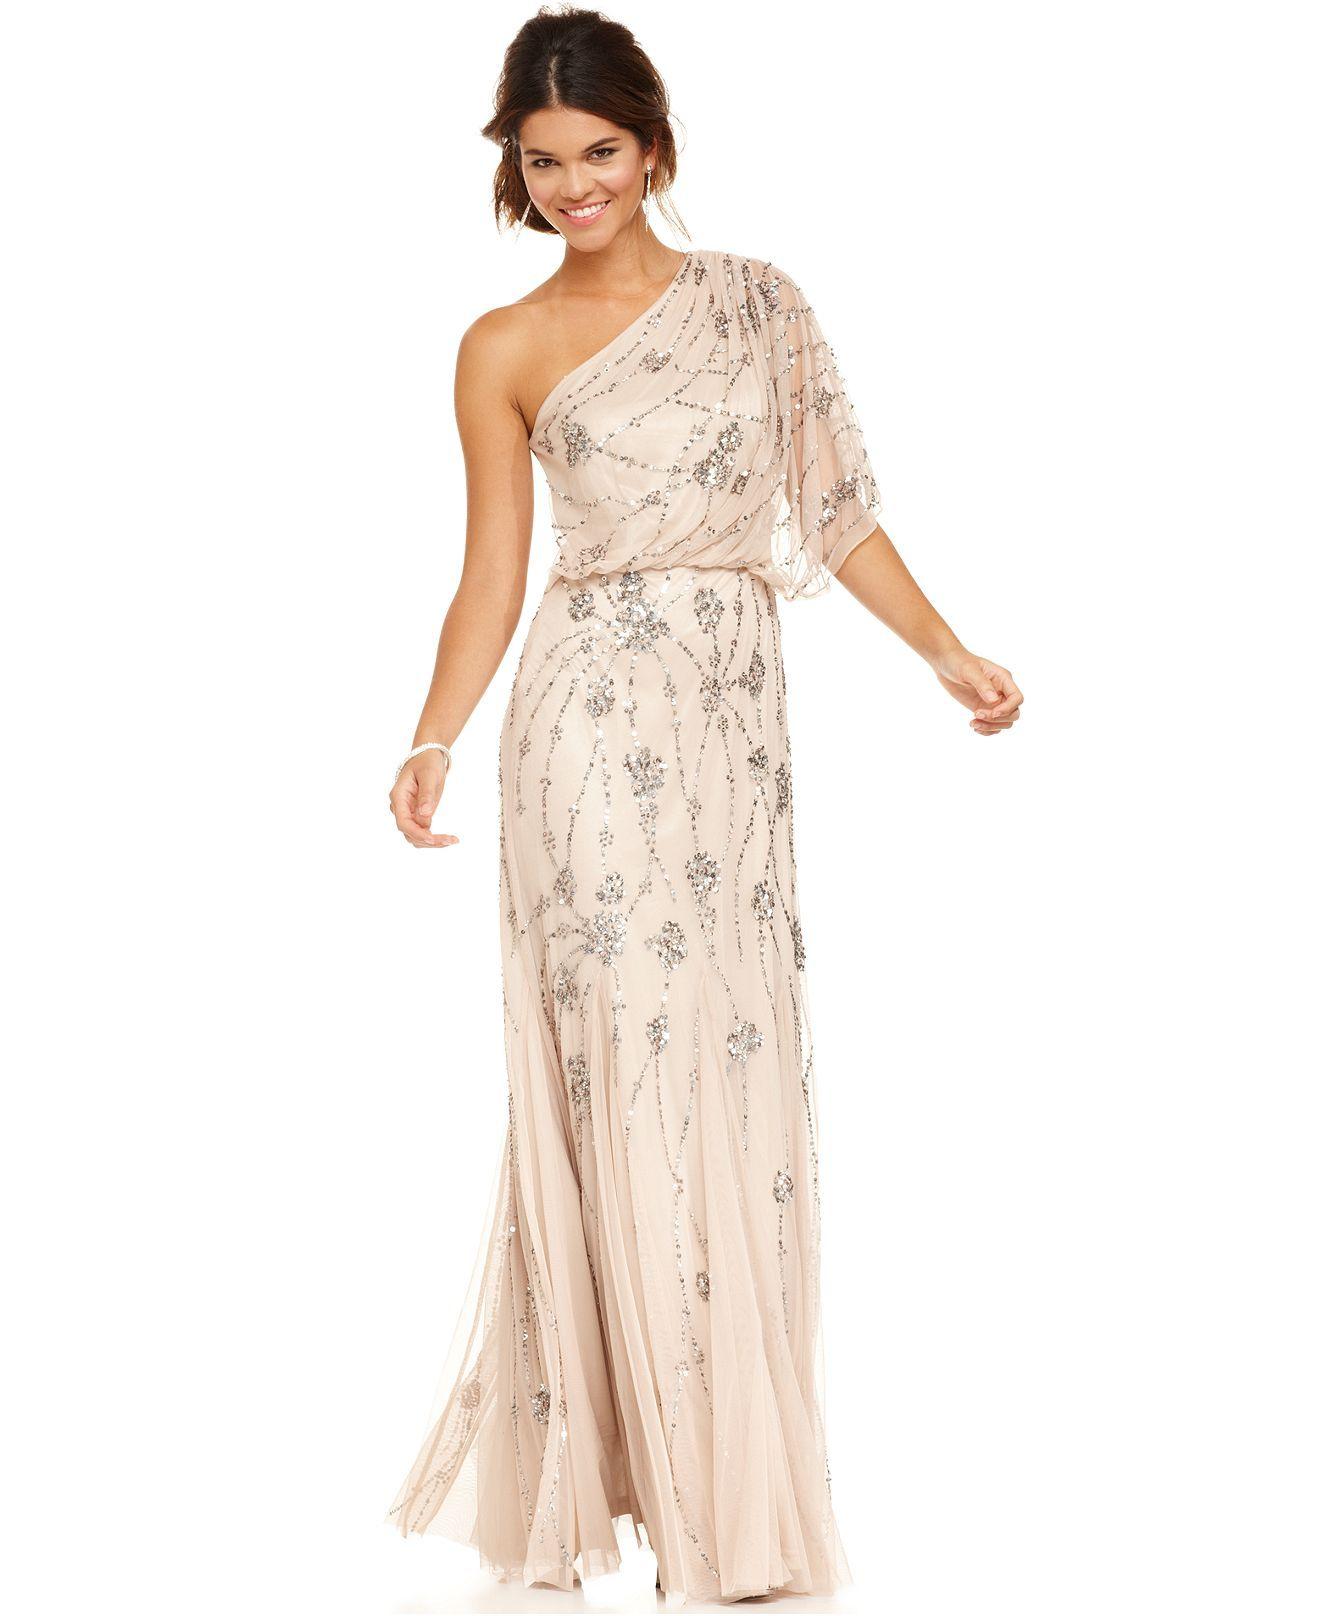 Adrianna papell dress shortsleeve oneshoulder beaded